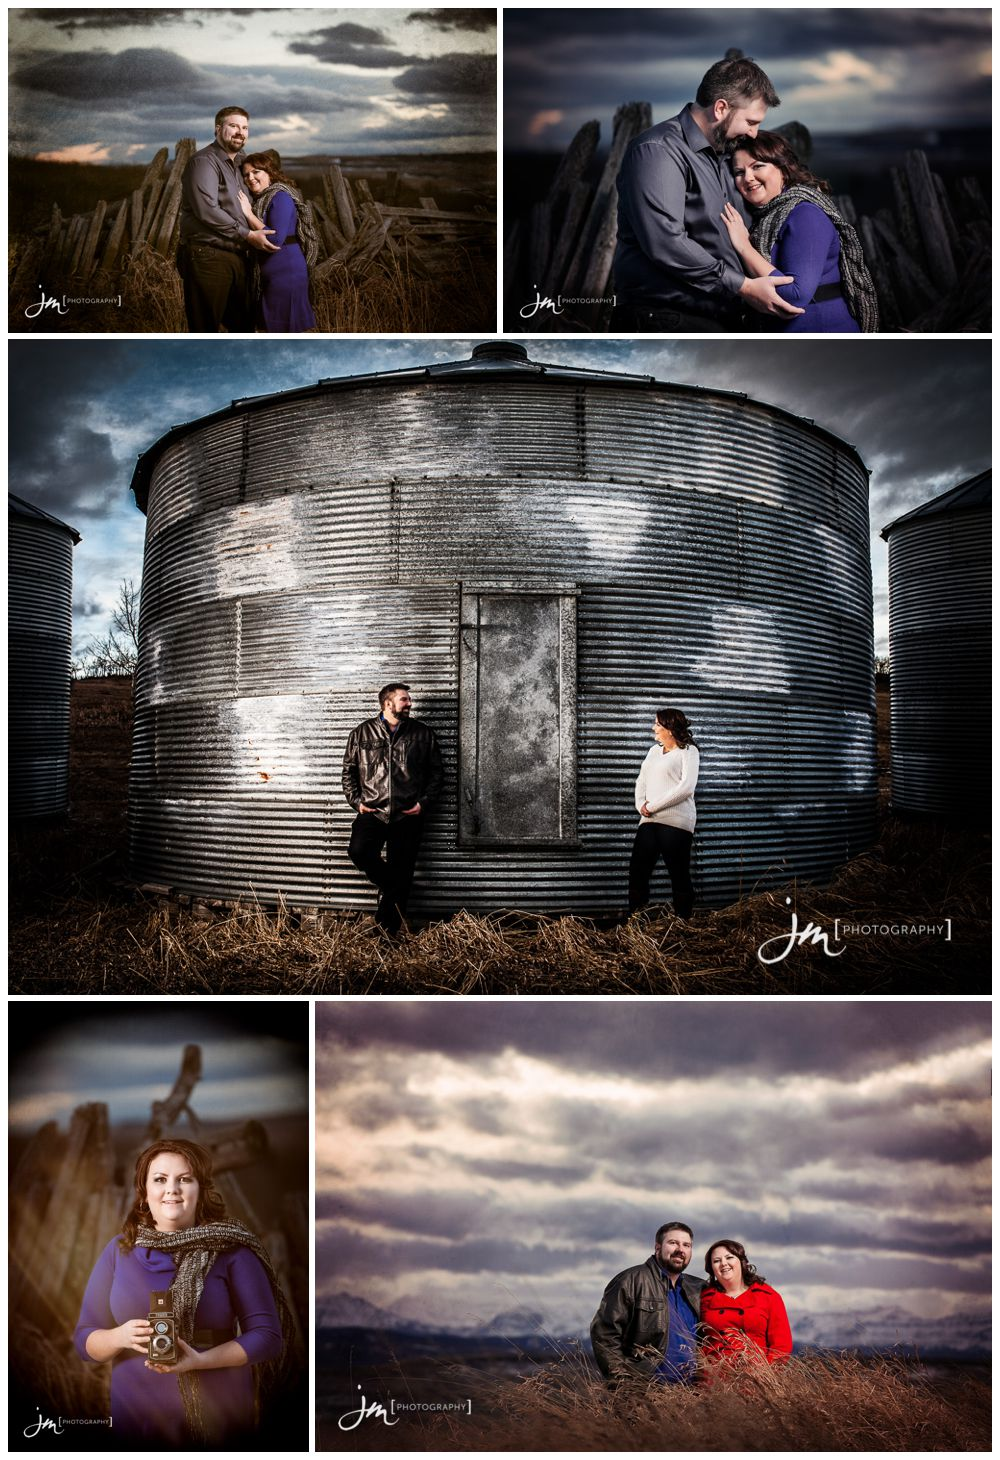 150207_200-Engagement-Photos-Calgary-JM_Photography-Jeremy-Martel